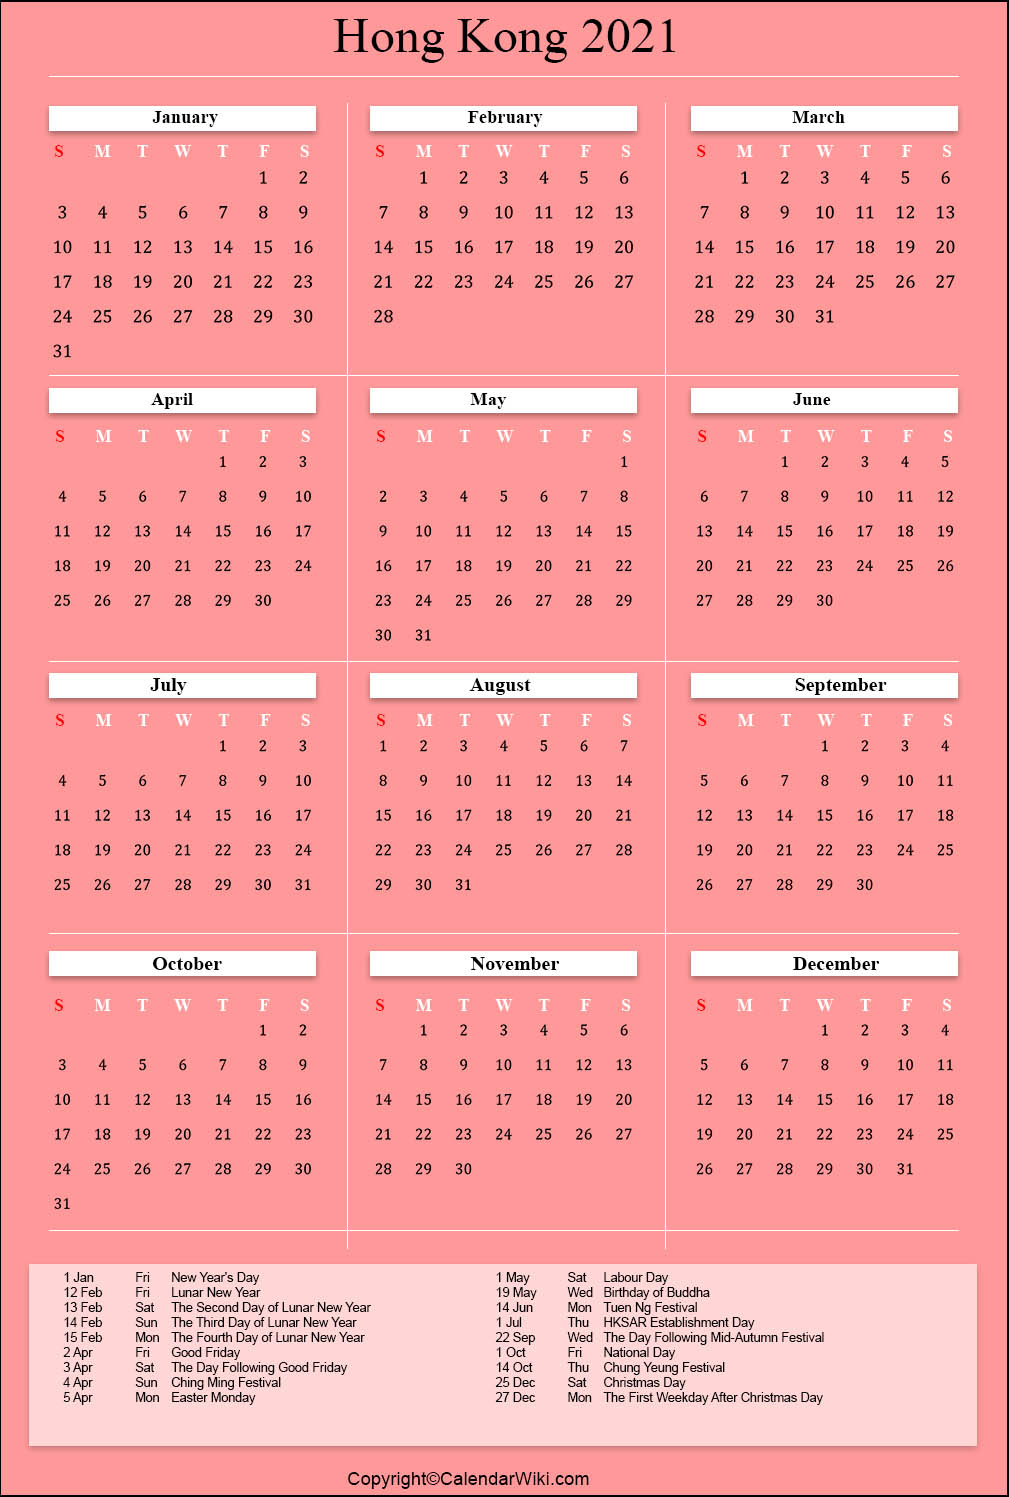 Printable Hongkong Calendar 2021 With Holidays [Public Holidays]